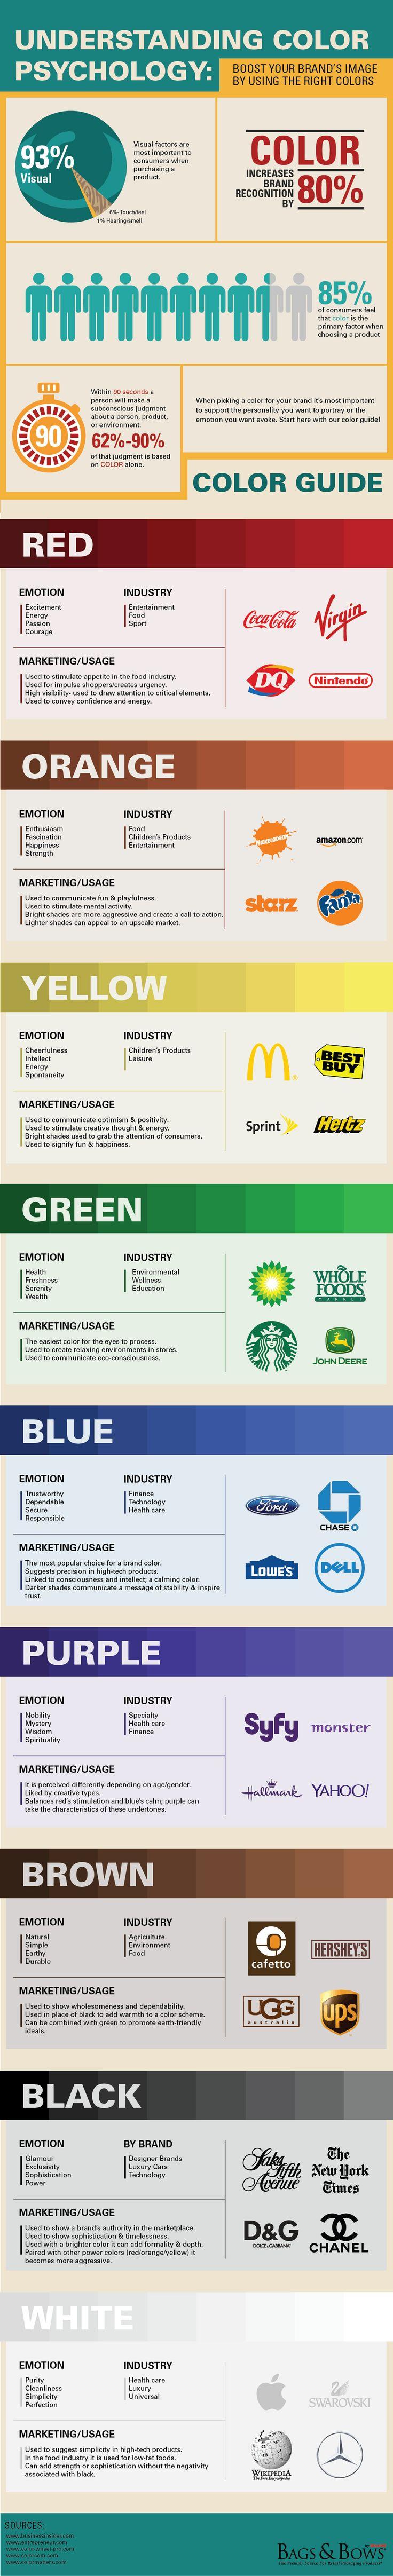 Branding-colors-in-web-design